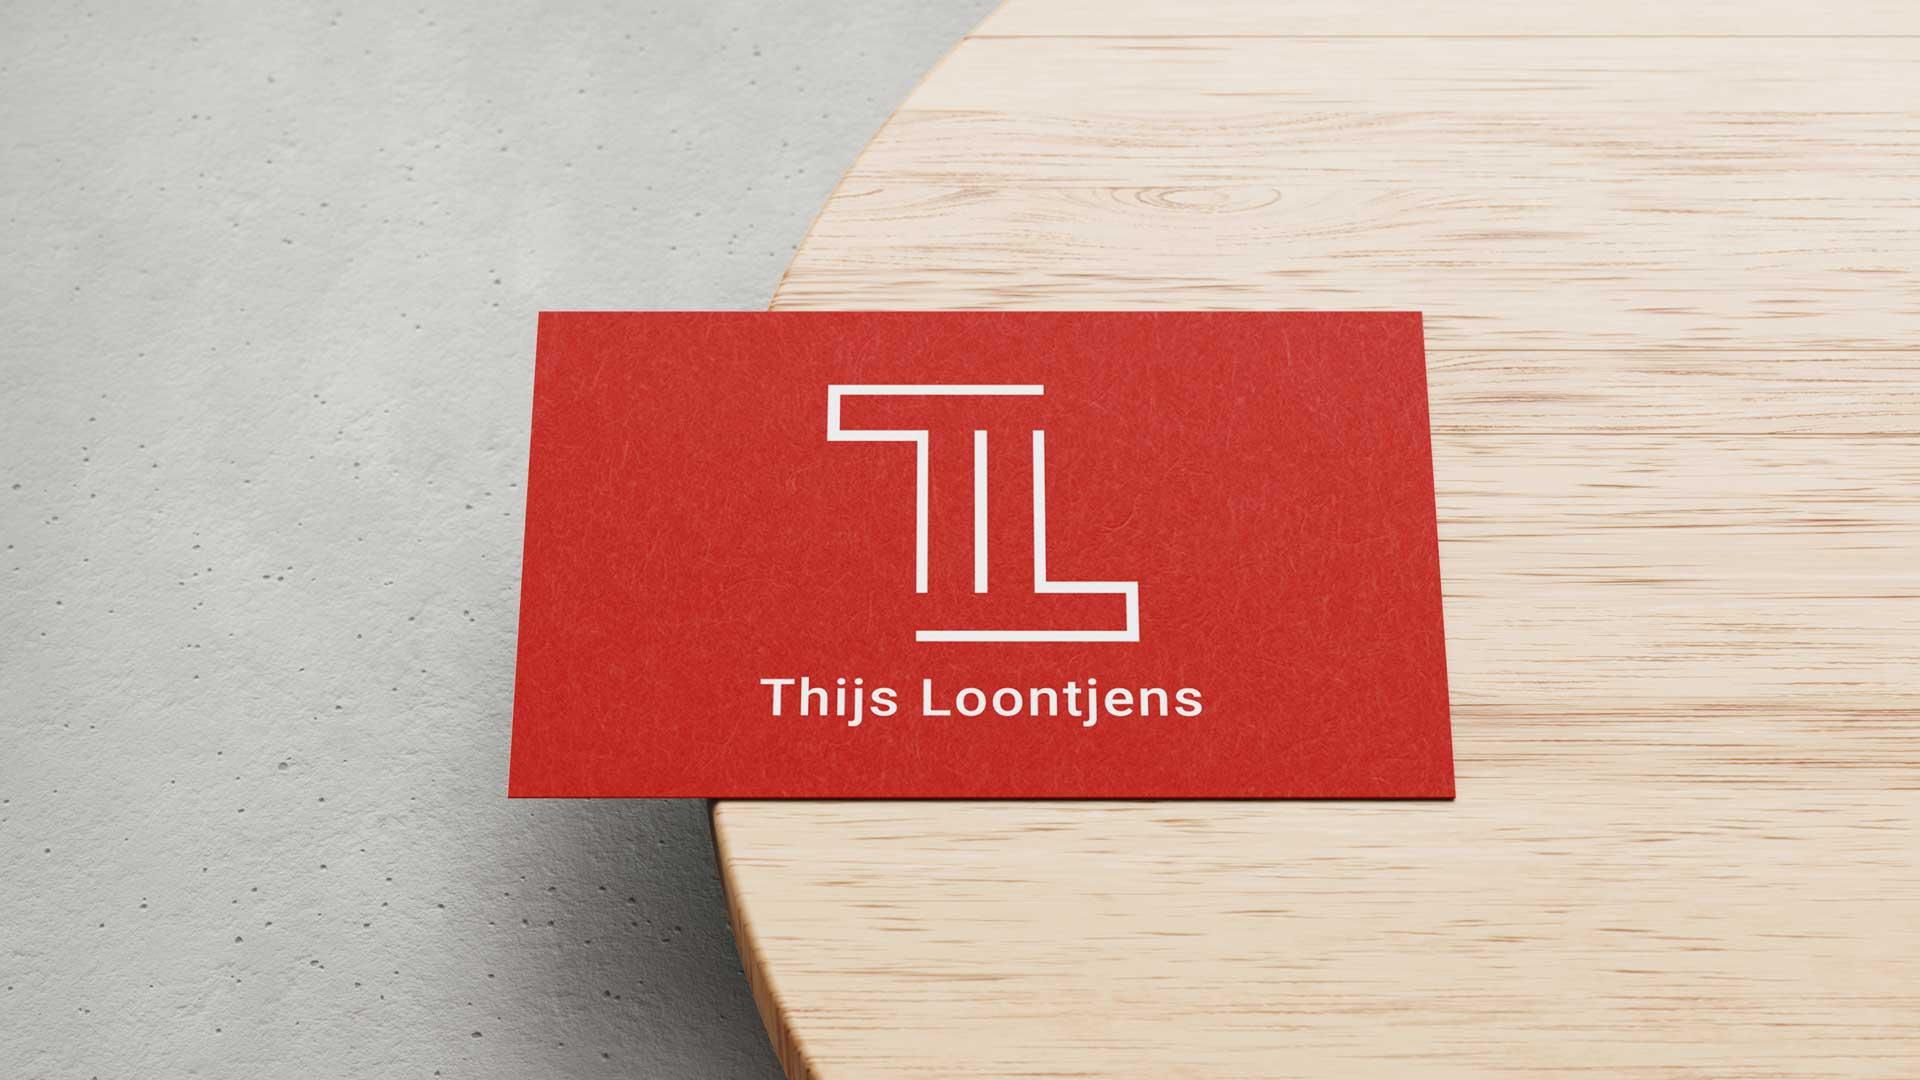 Thijs Loontjens